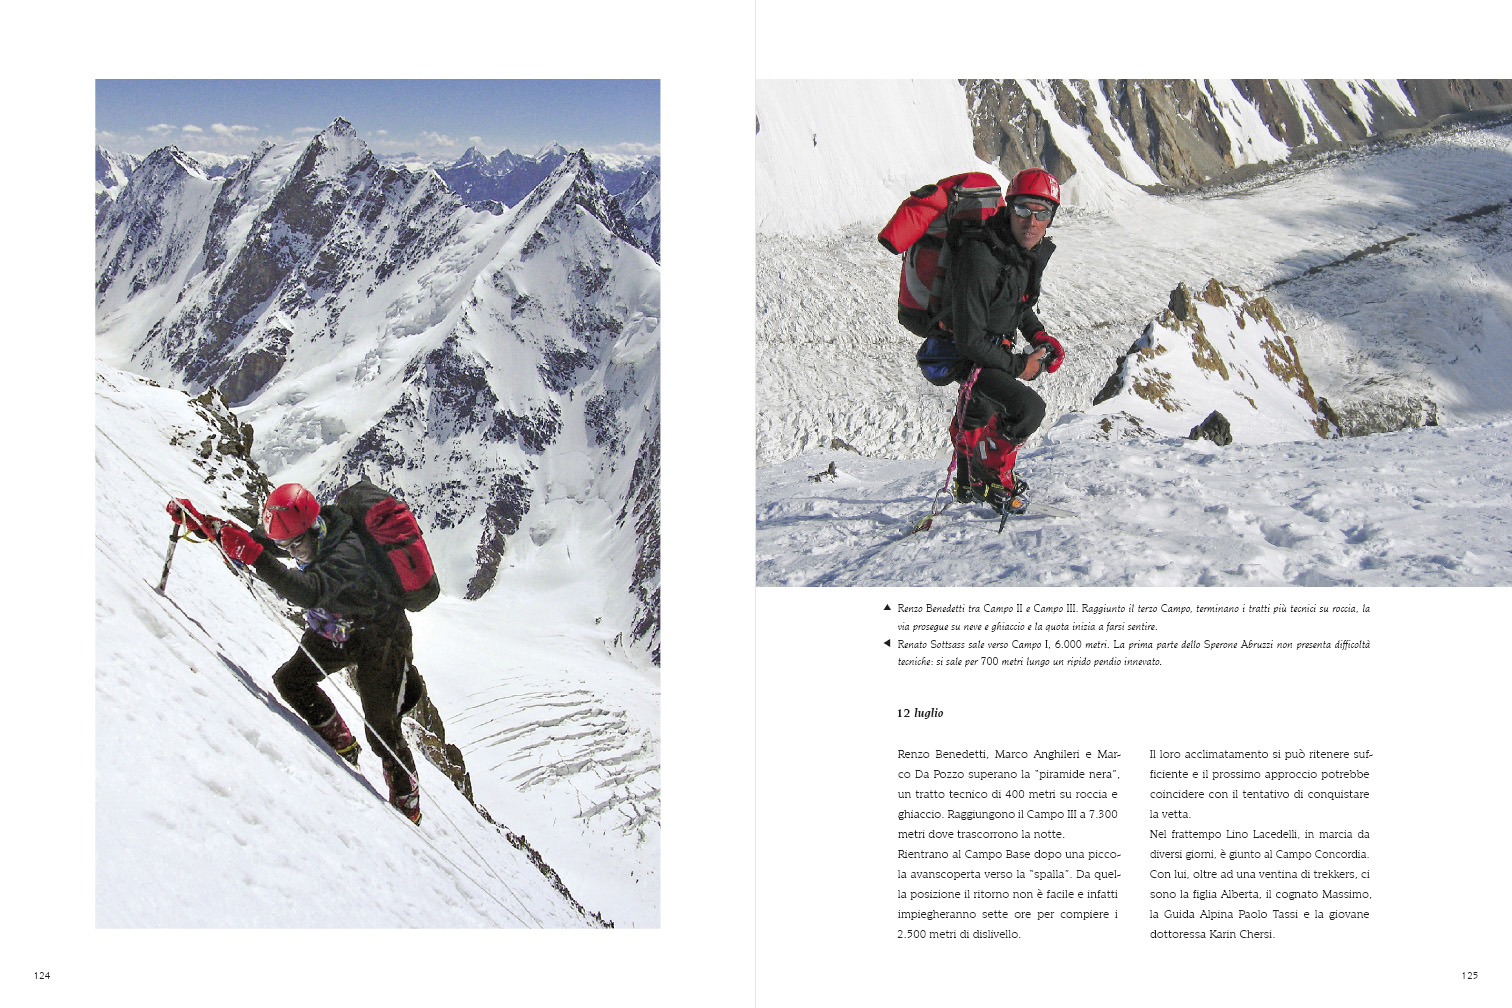 K2 EXPEDITION 1954-2004 Giuseppe Ghedina Fotografo - 064.jpg